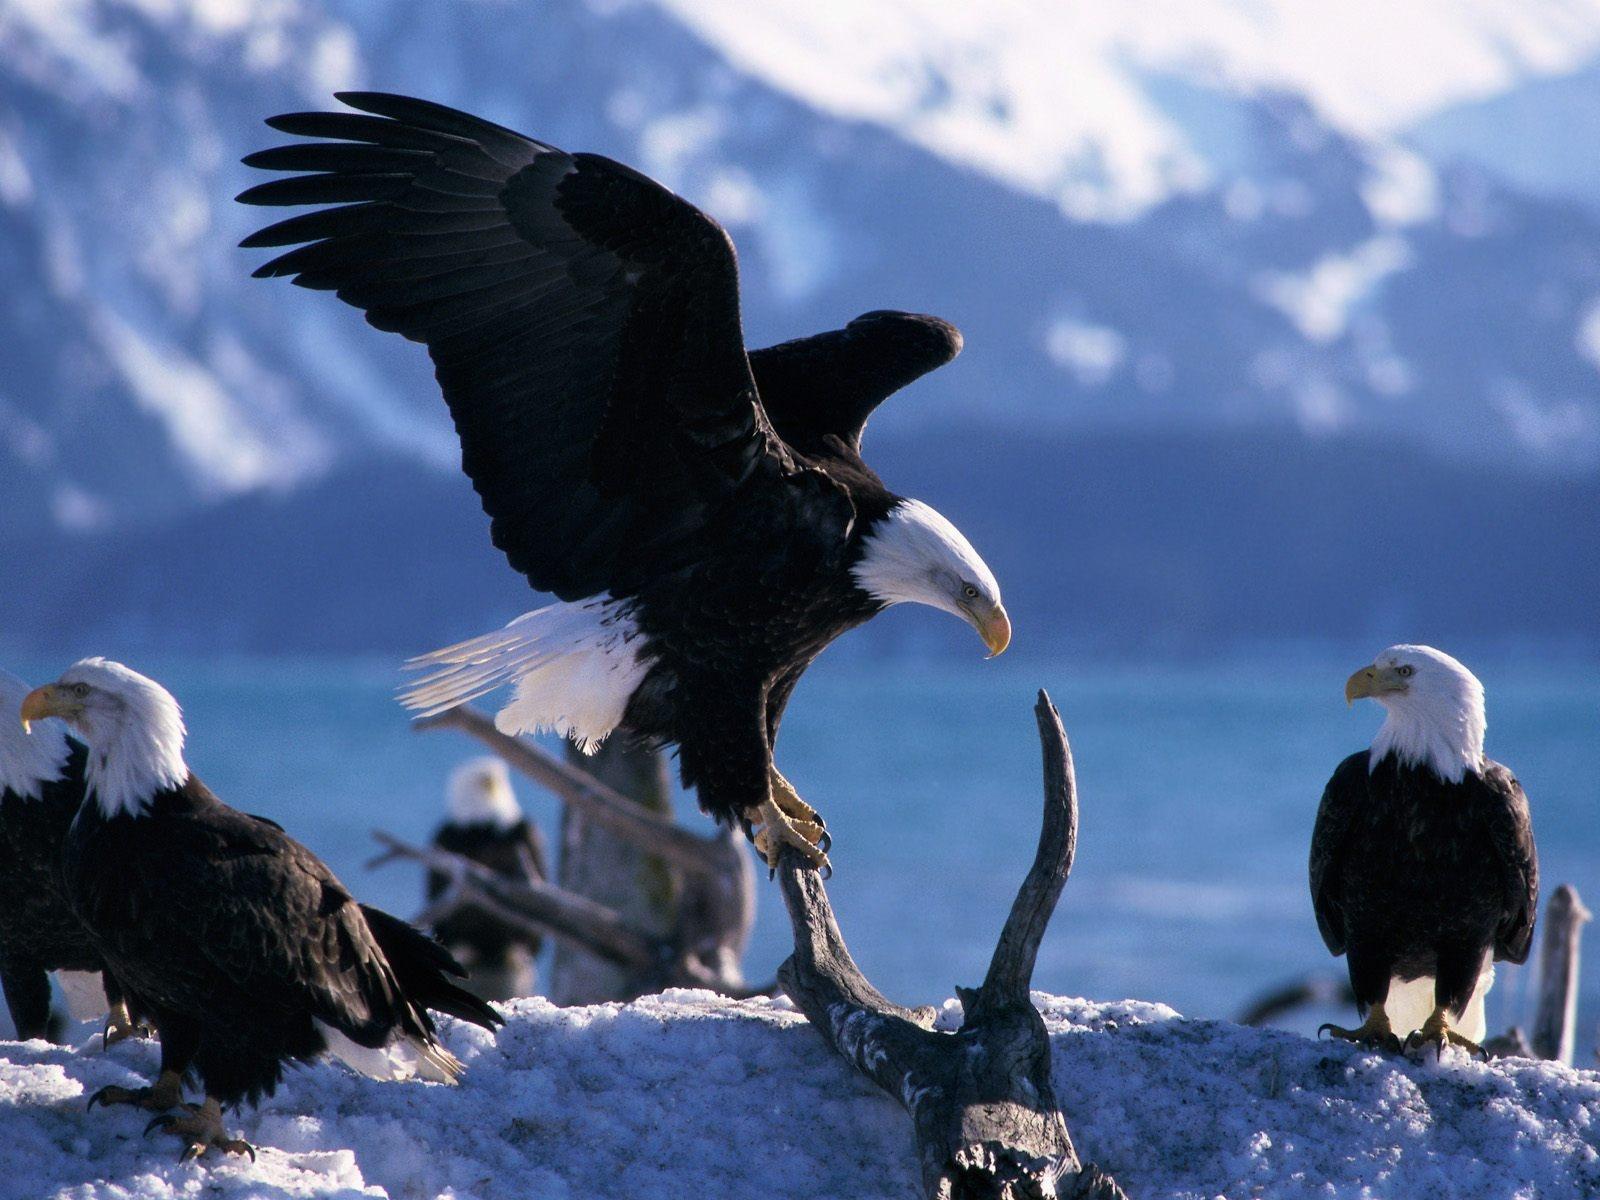 http://4.bp.blogspot.com/-tl9i1d3S7SM/TuI_GKXrJgI/AAAAAAAABng/Lv1Z7lAKJpQ/s1600/birds-16-1600x1200.jpg